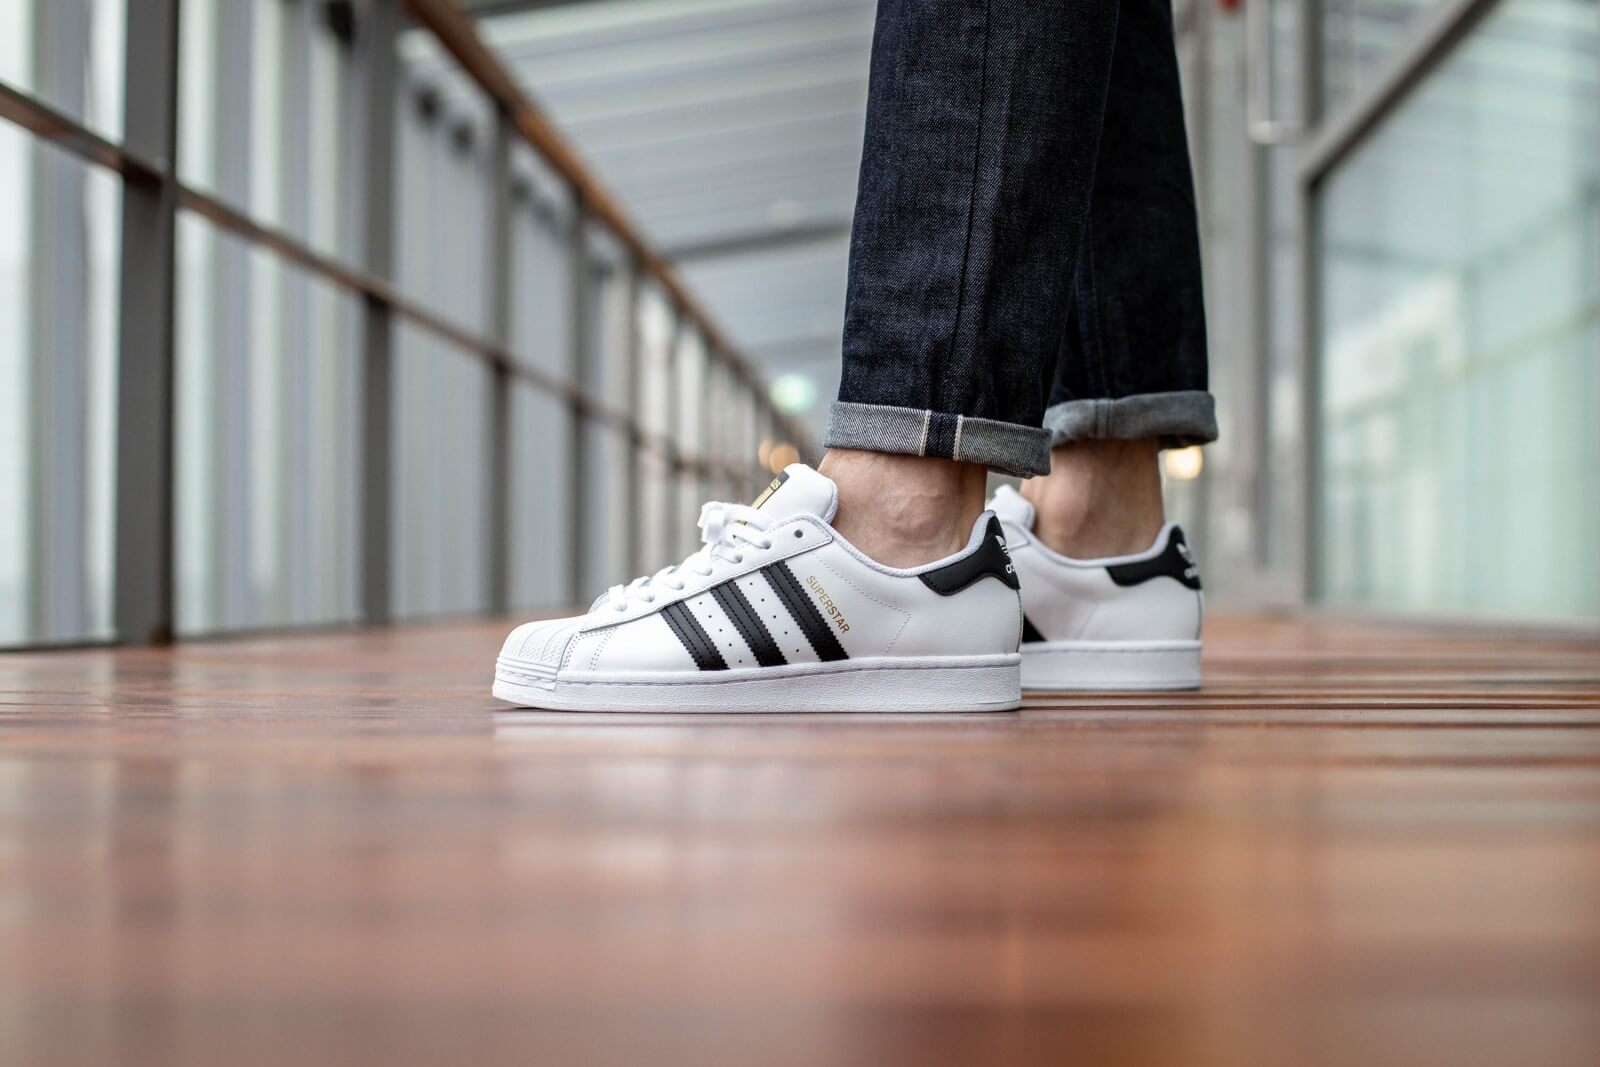 Adidas Superstar Cloud White/Core Black